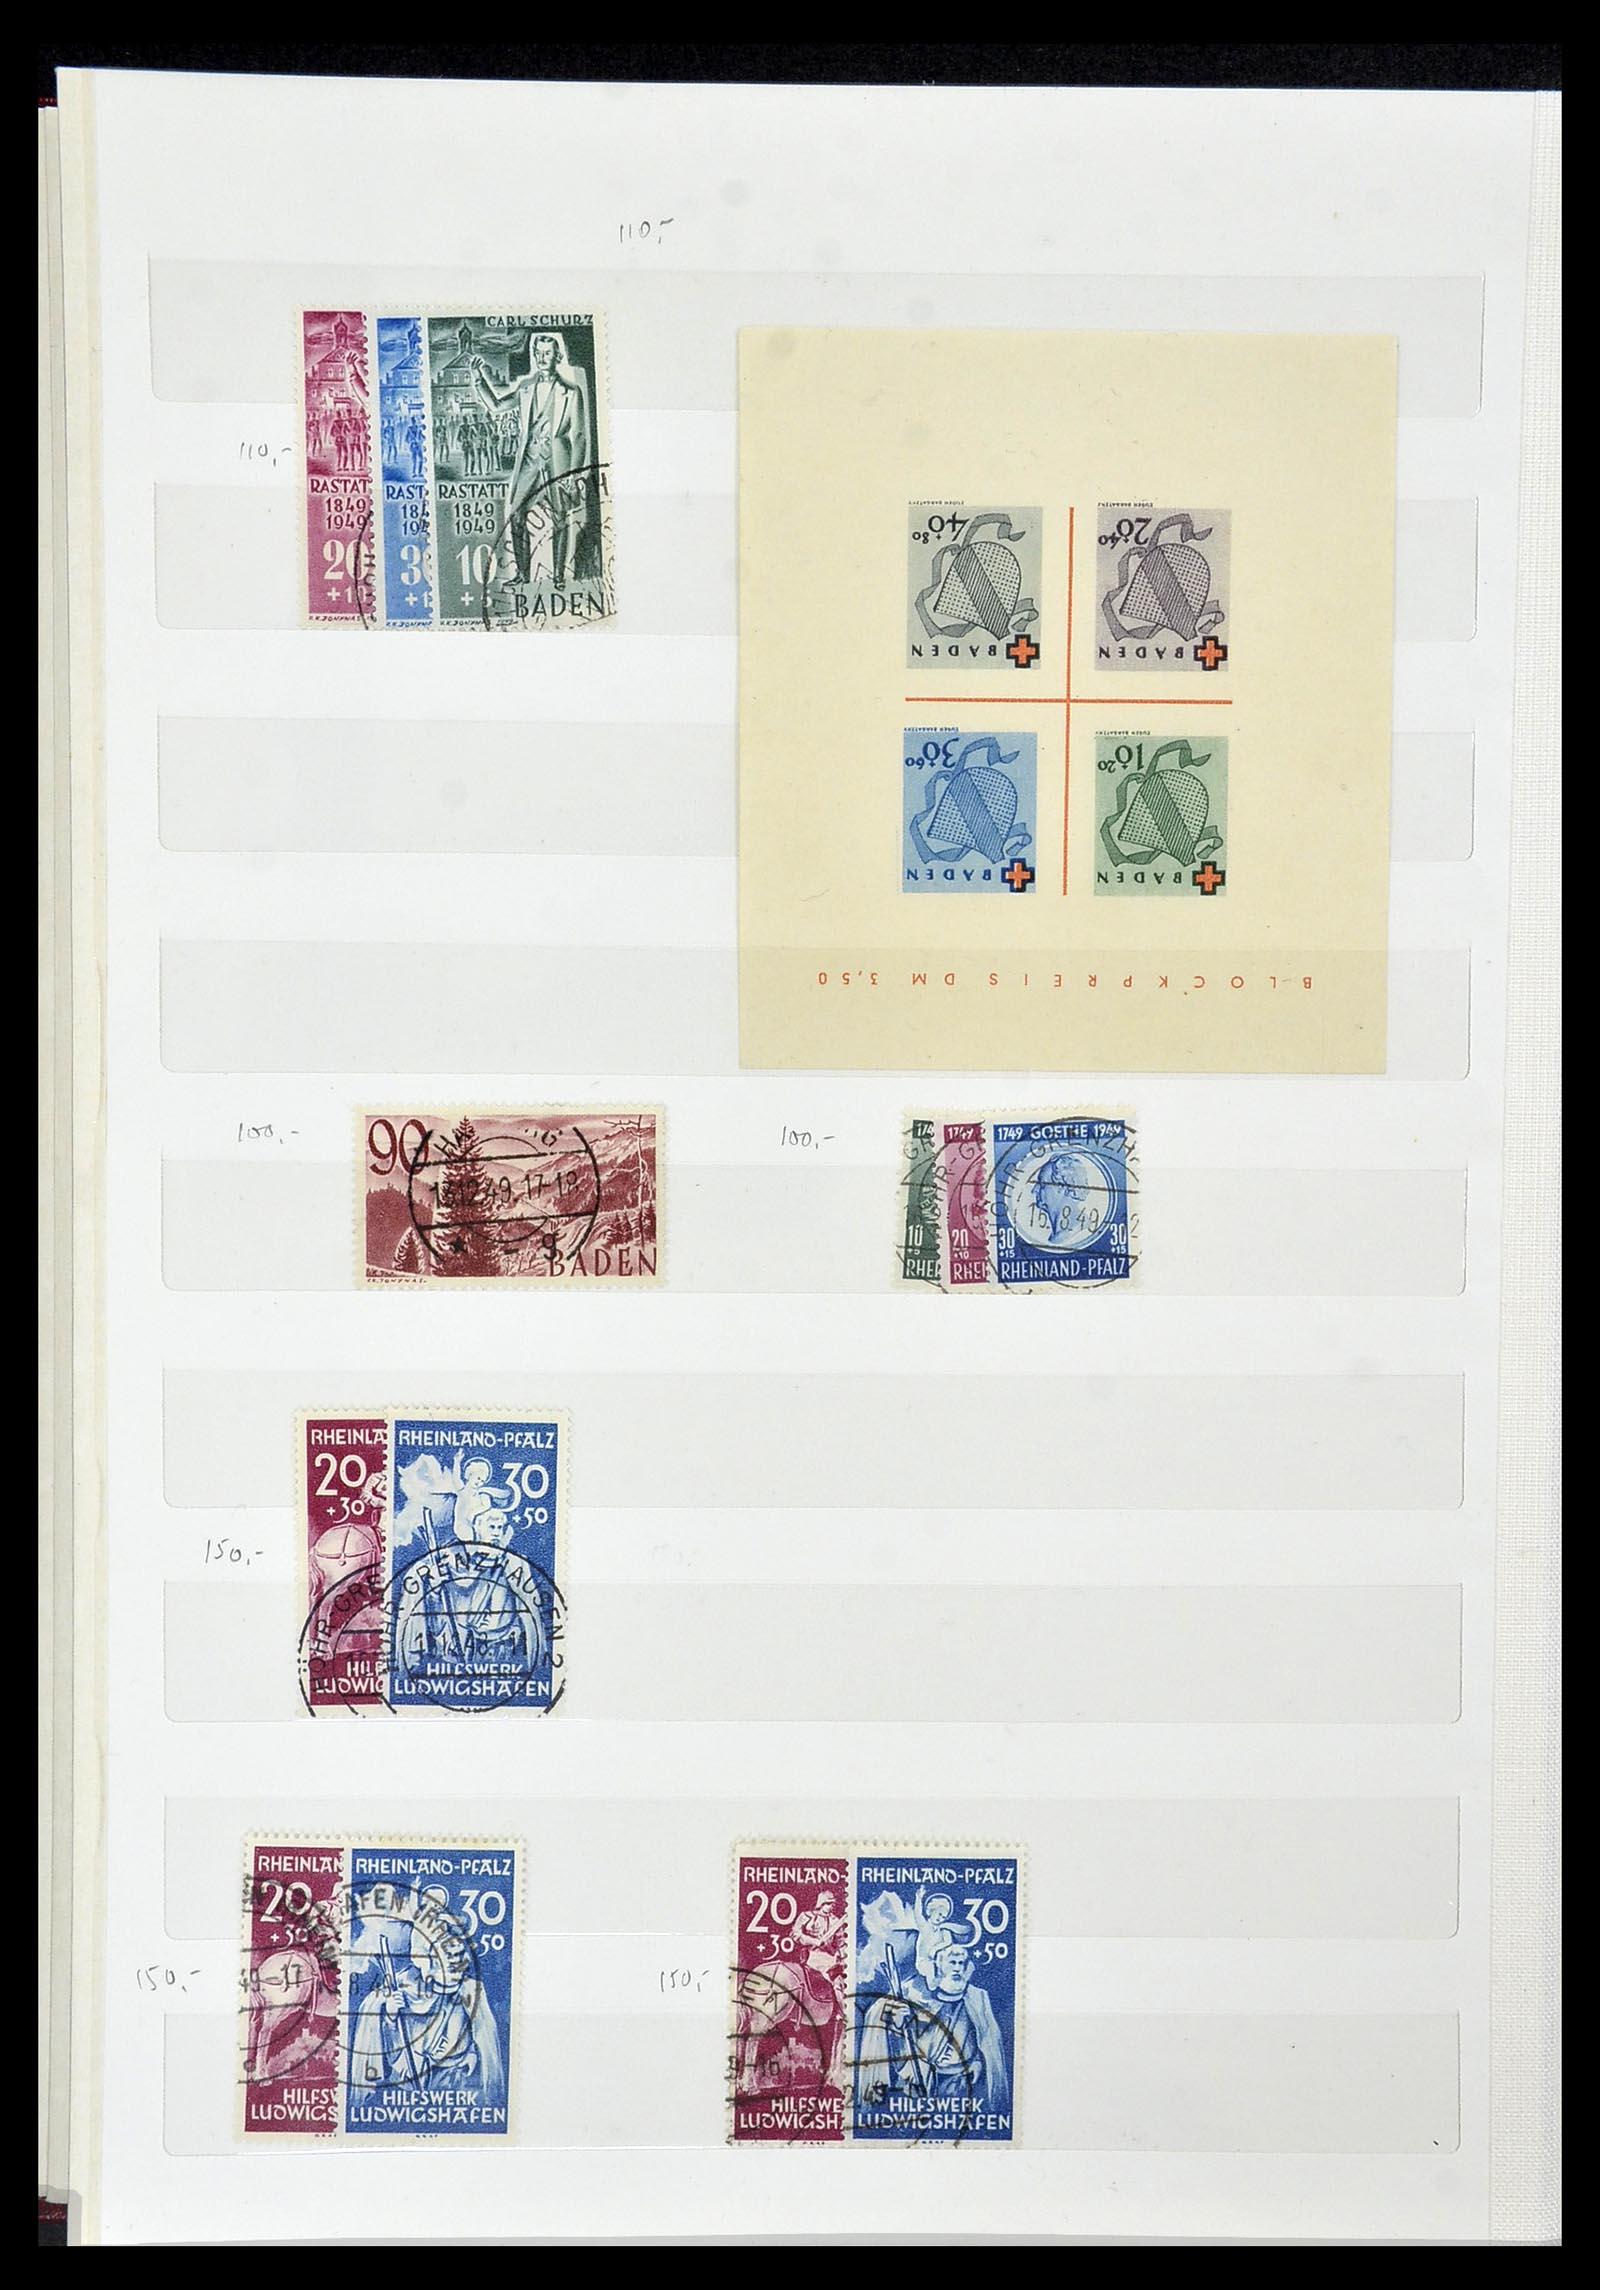 34069 011 - Postzegelverzameling 34069 Duitsland 1855-1952.